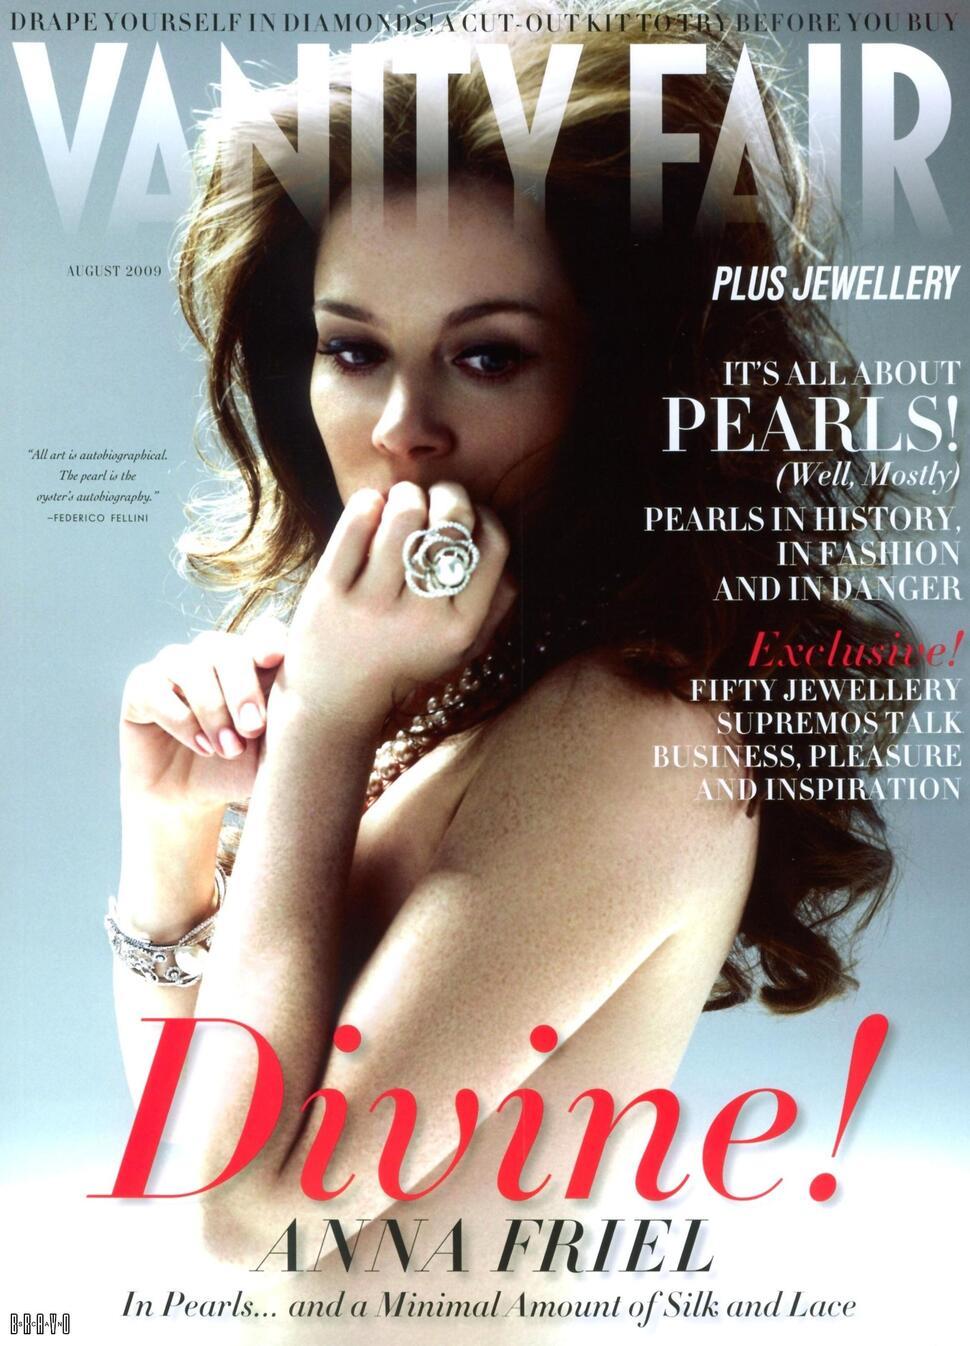 Анна Фрил в журнале Vanity Fair. Август 2009